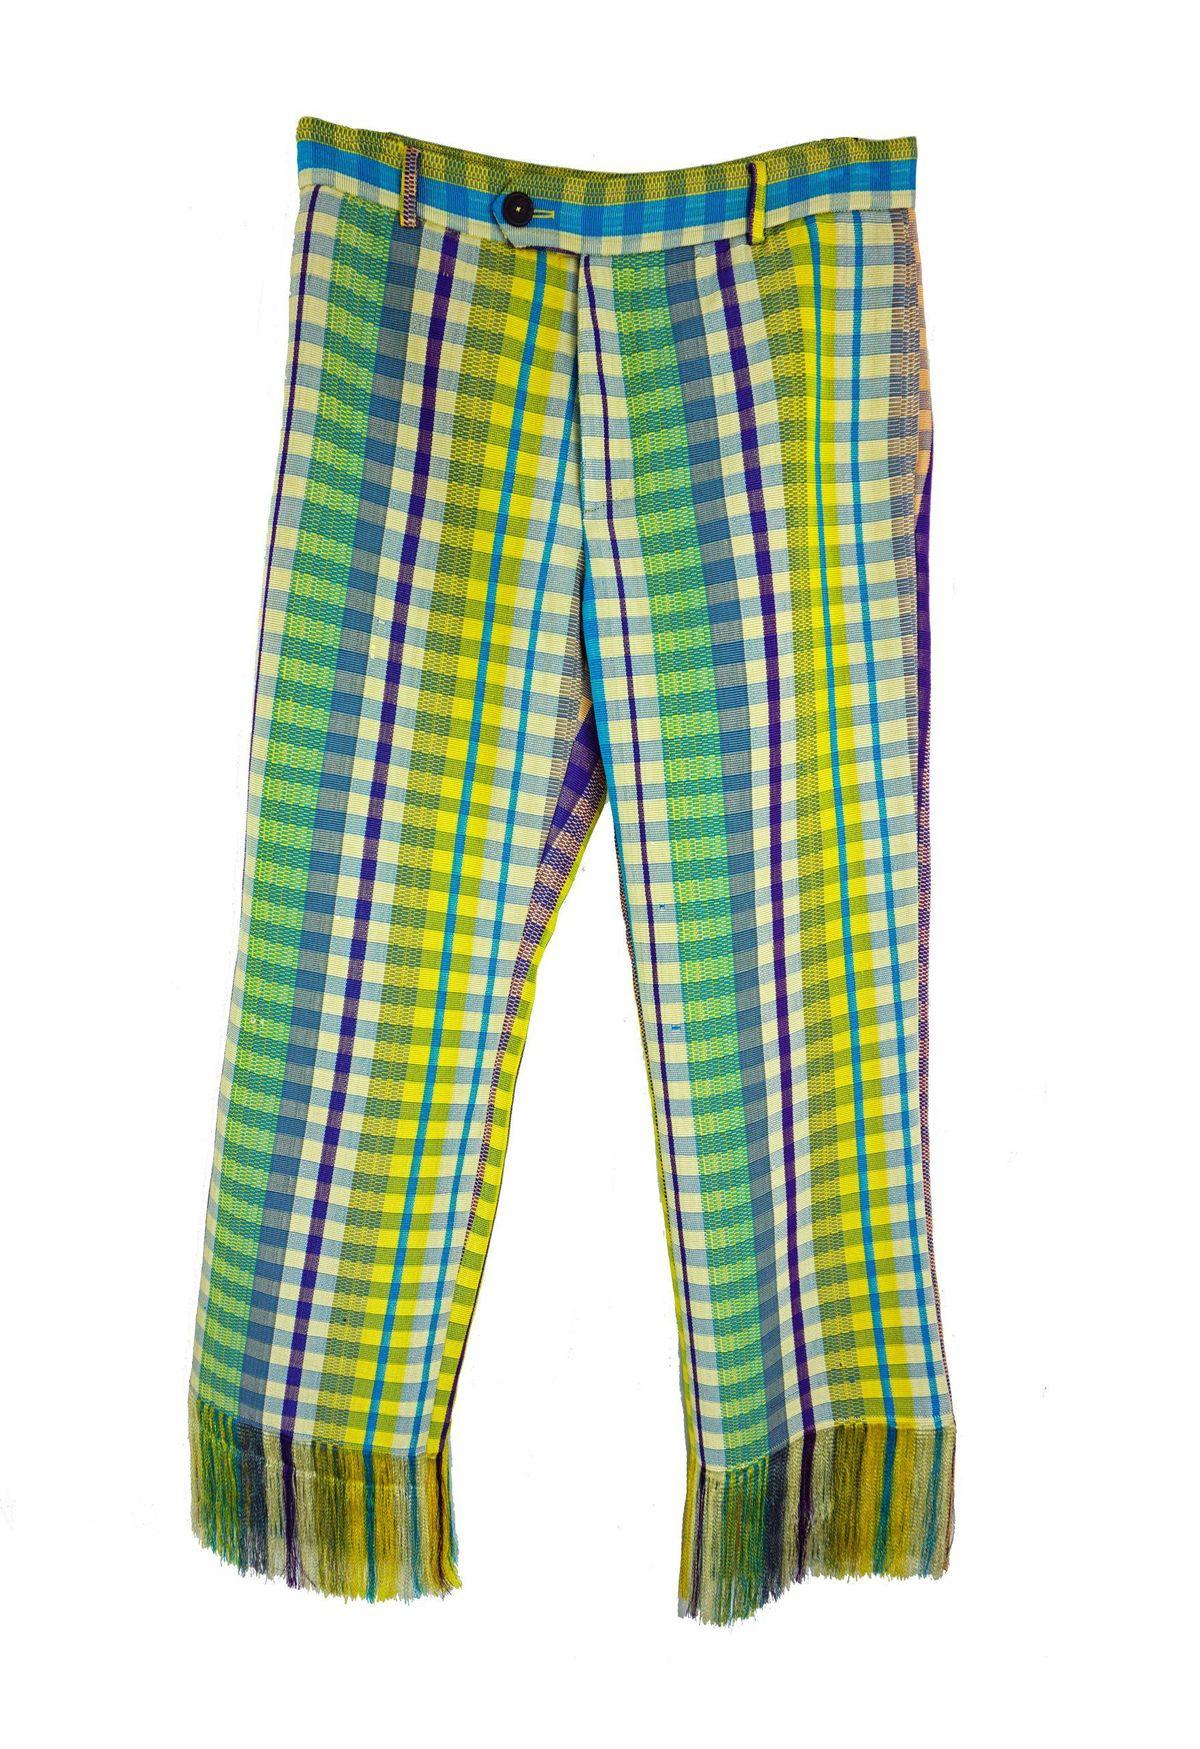 Josh Fringed Trousers